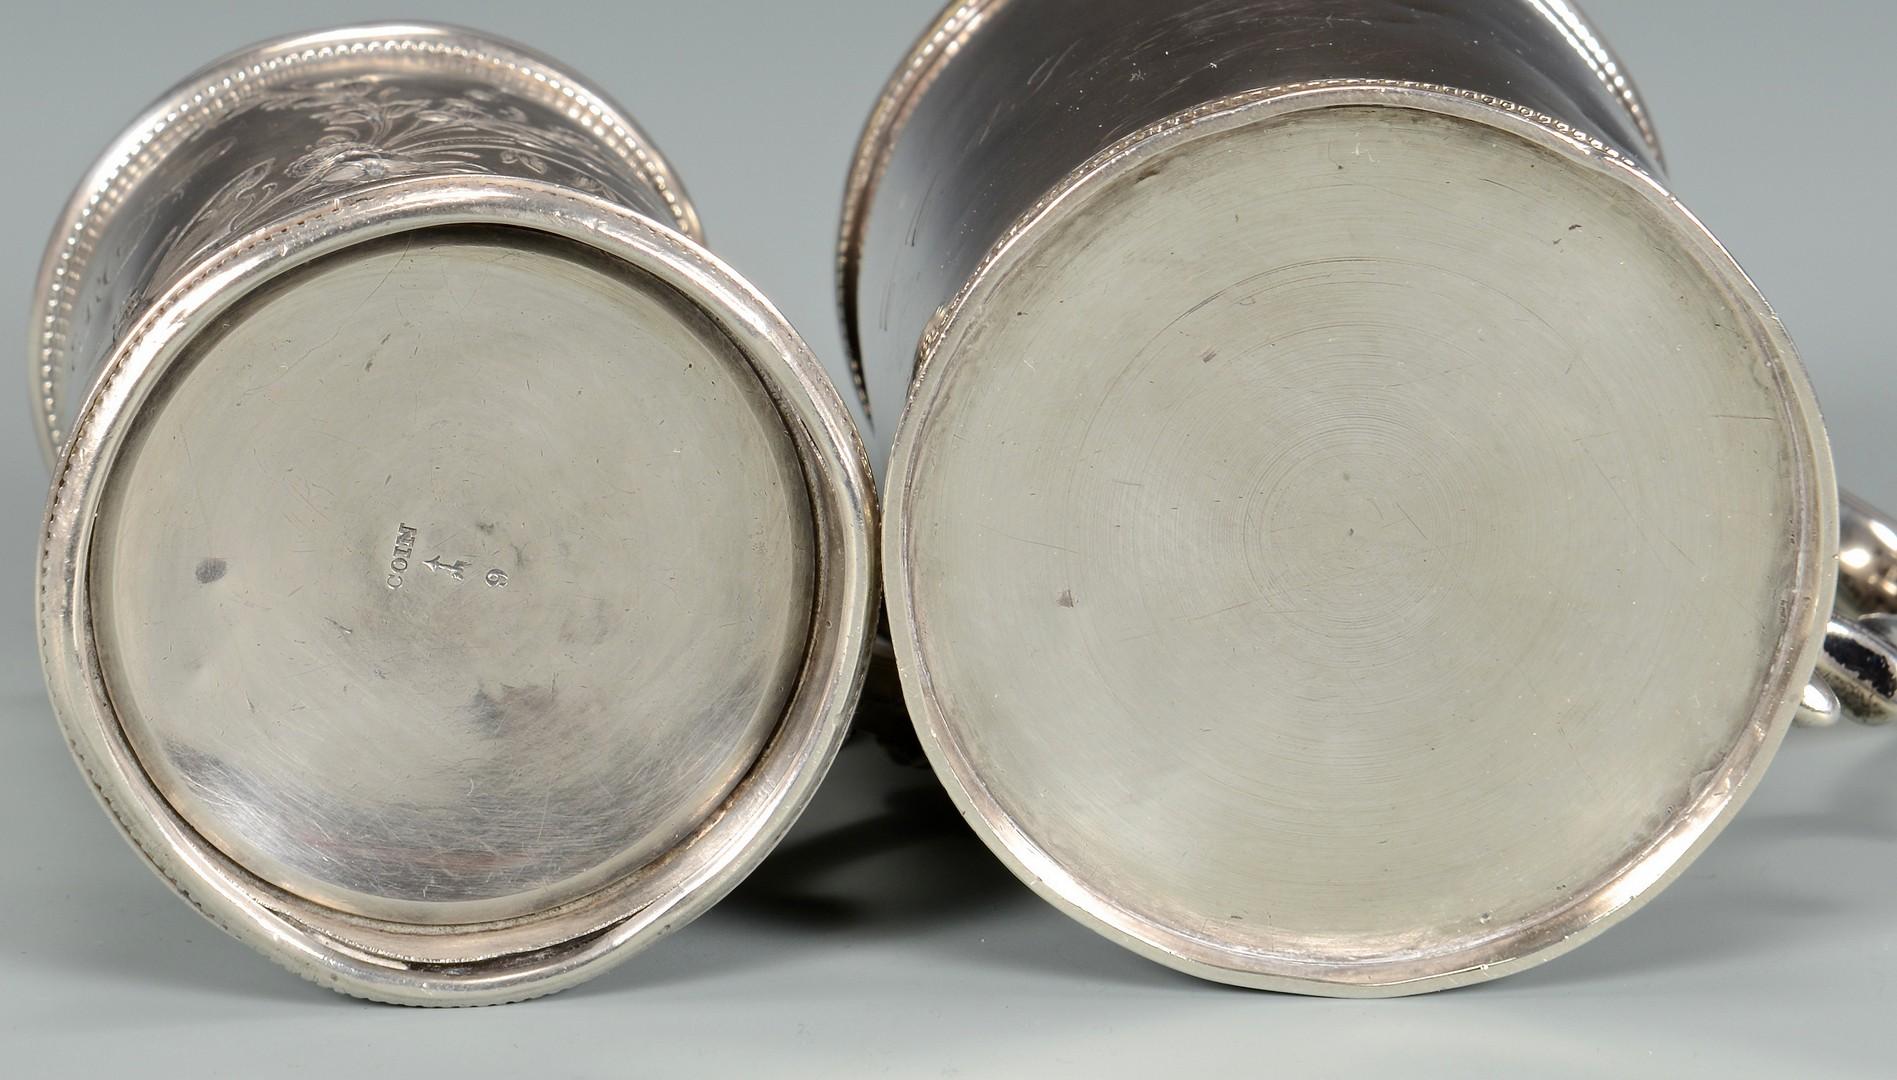 Lot 324: 2 Coin Silver Cups plus ladle